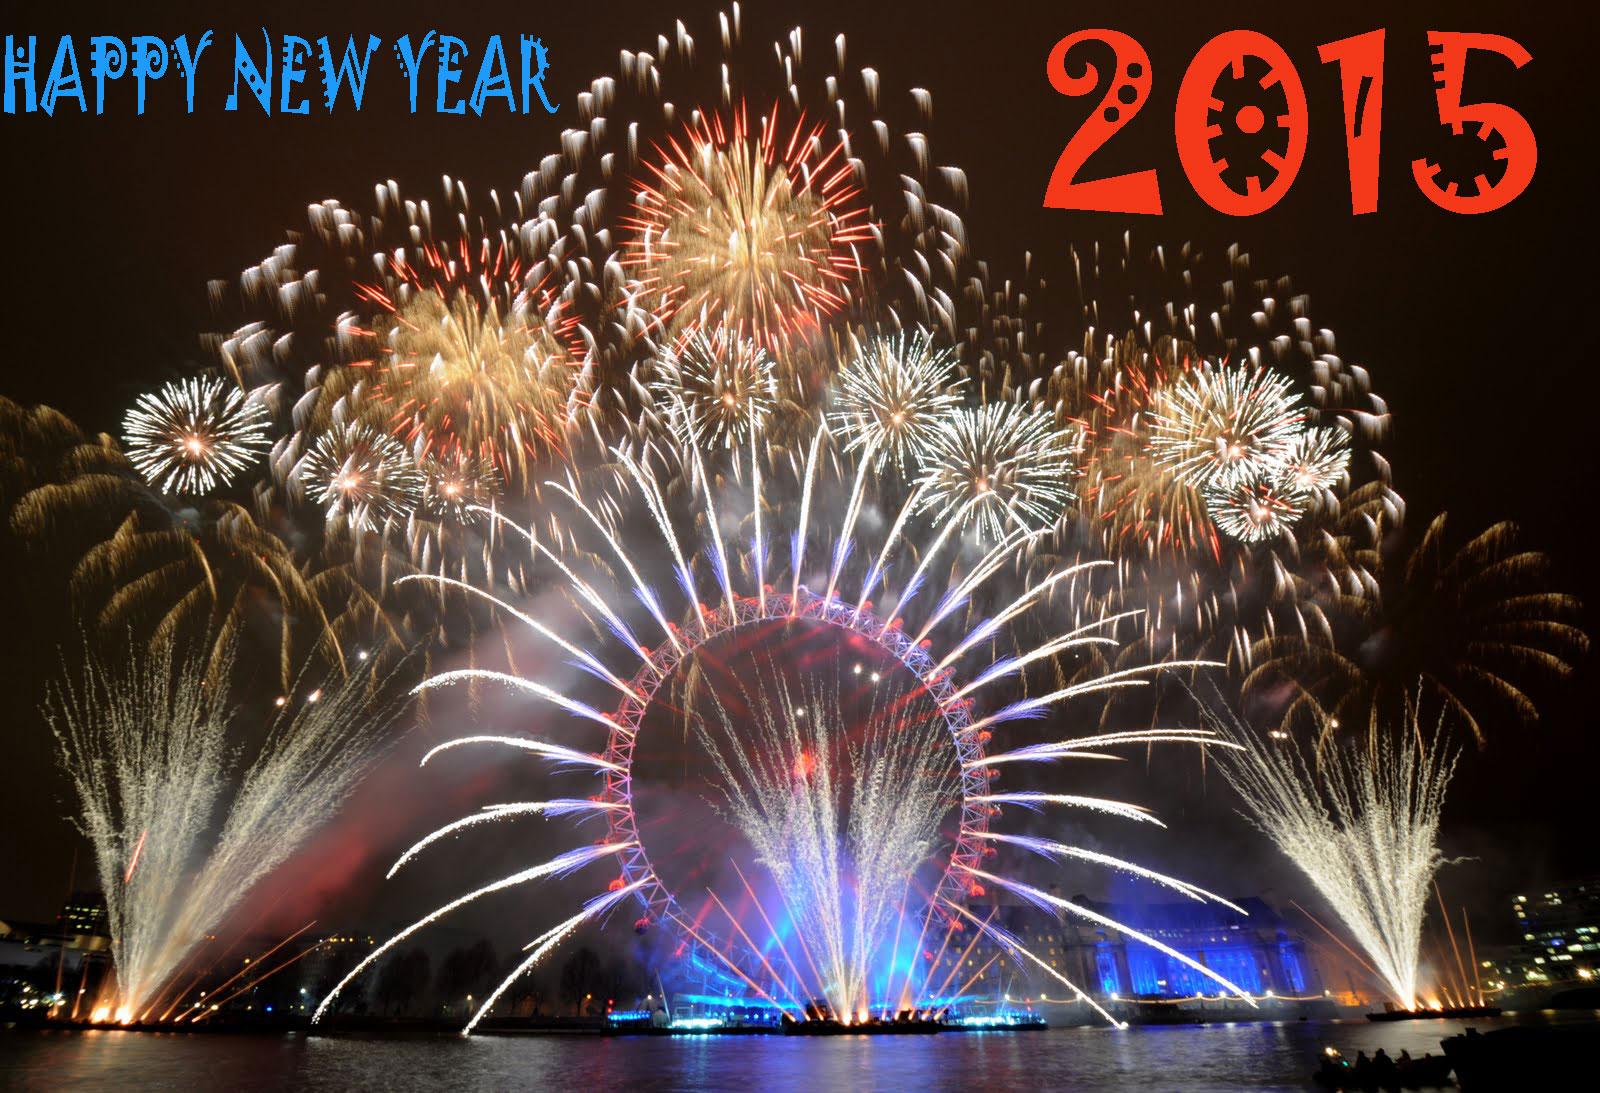 2015 Happy New Year Wallpapers   2015 Happy New Year Wallpaper 1600x1093